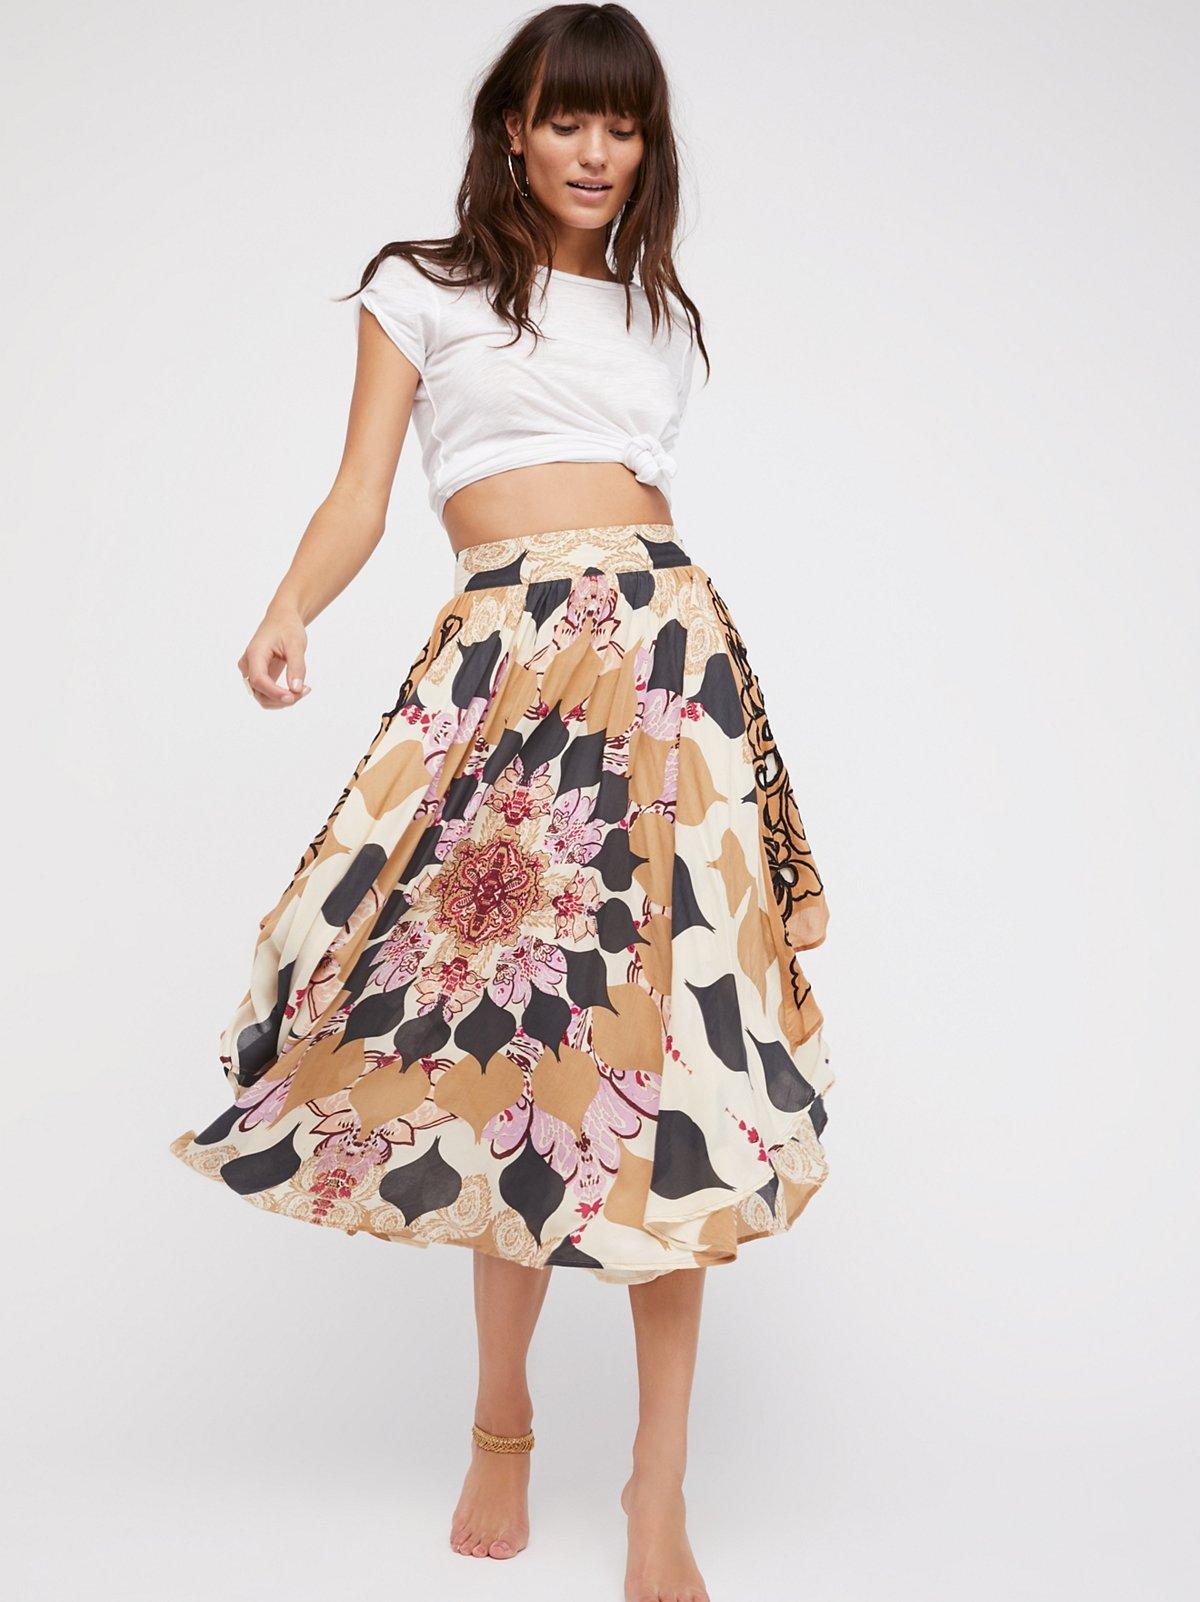 Lights Beam Skirt